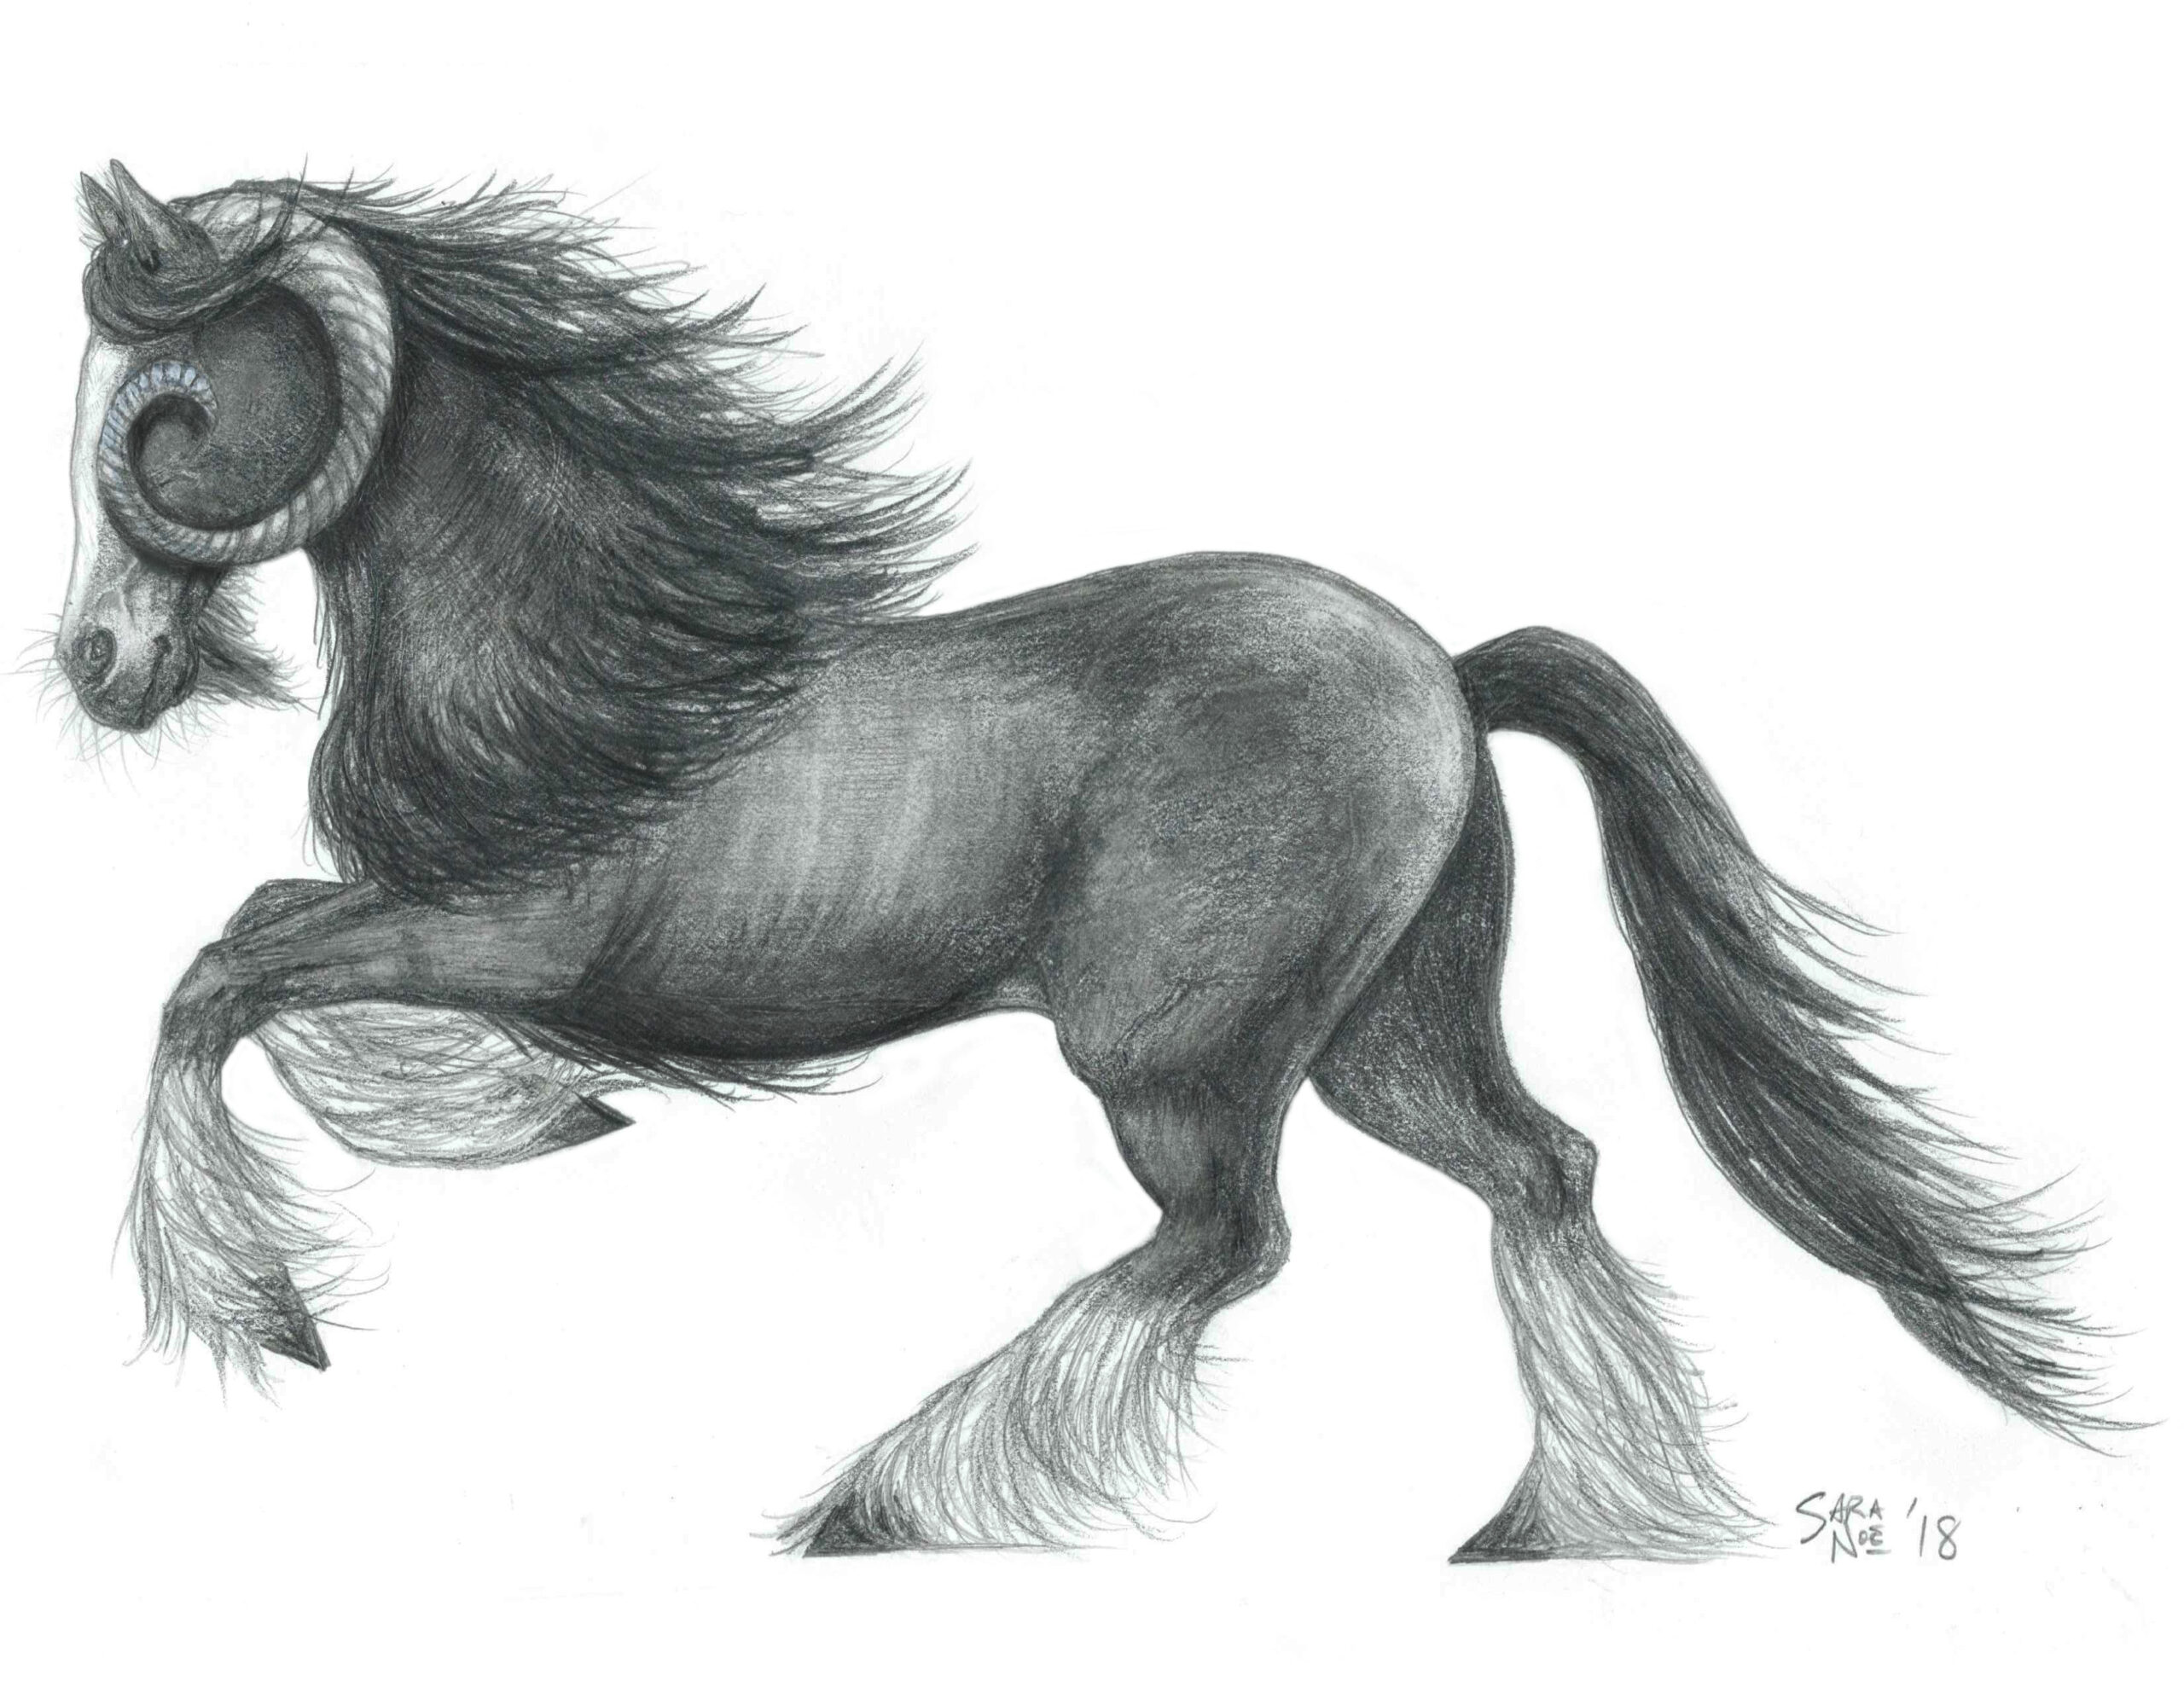 Mystical horse bilocorn pencil sketch by Sara A. Noe